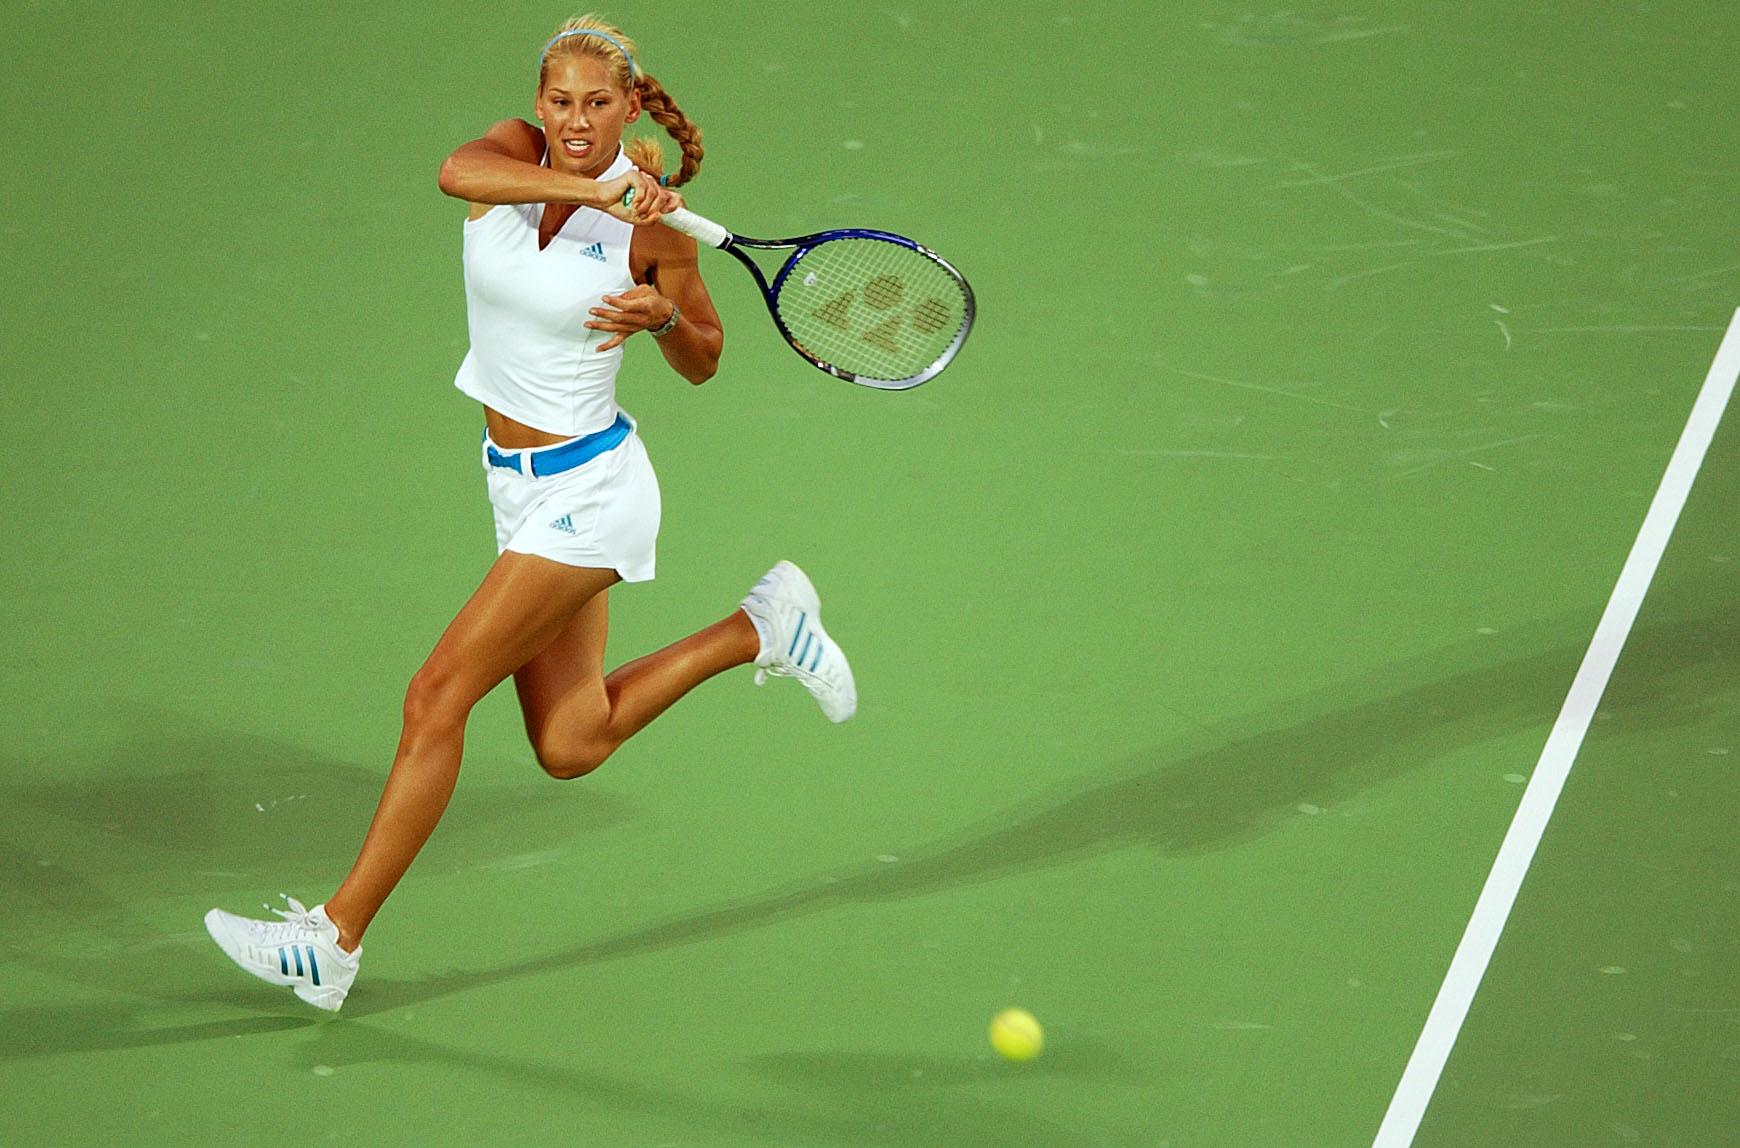 Anna Kournikova displayed her favorite designer brand and colors in an all Adidas tennis attire.